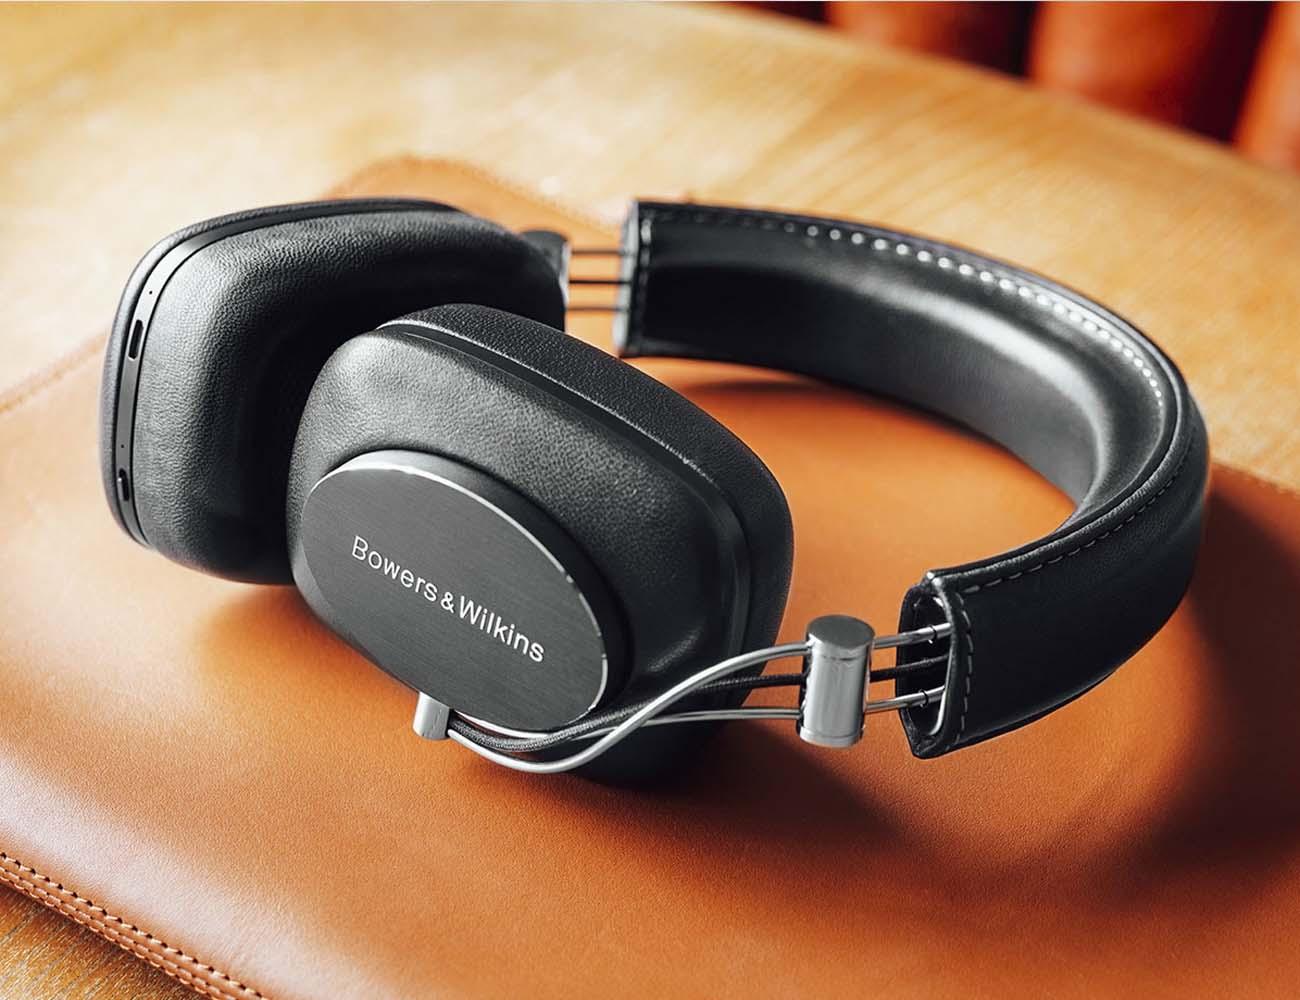 P5 Wireless Headphones by Bowers & Wilkins